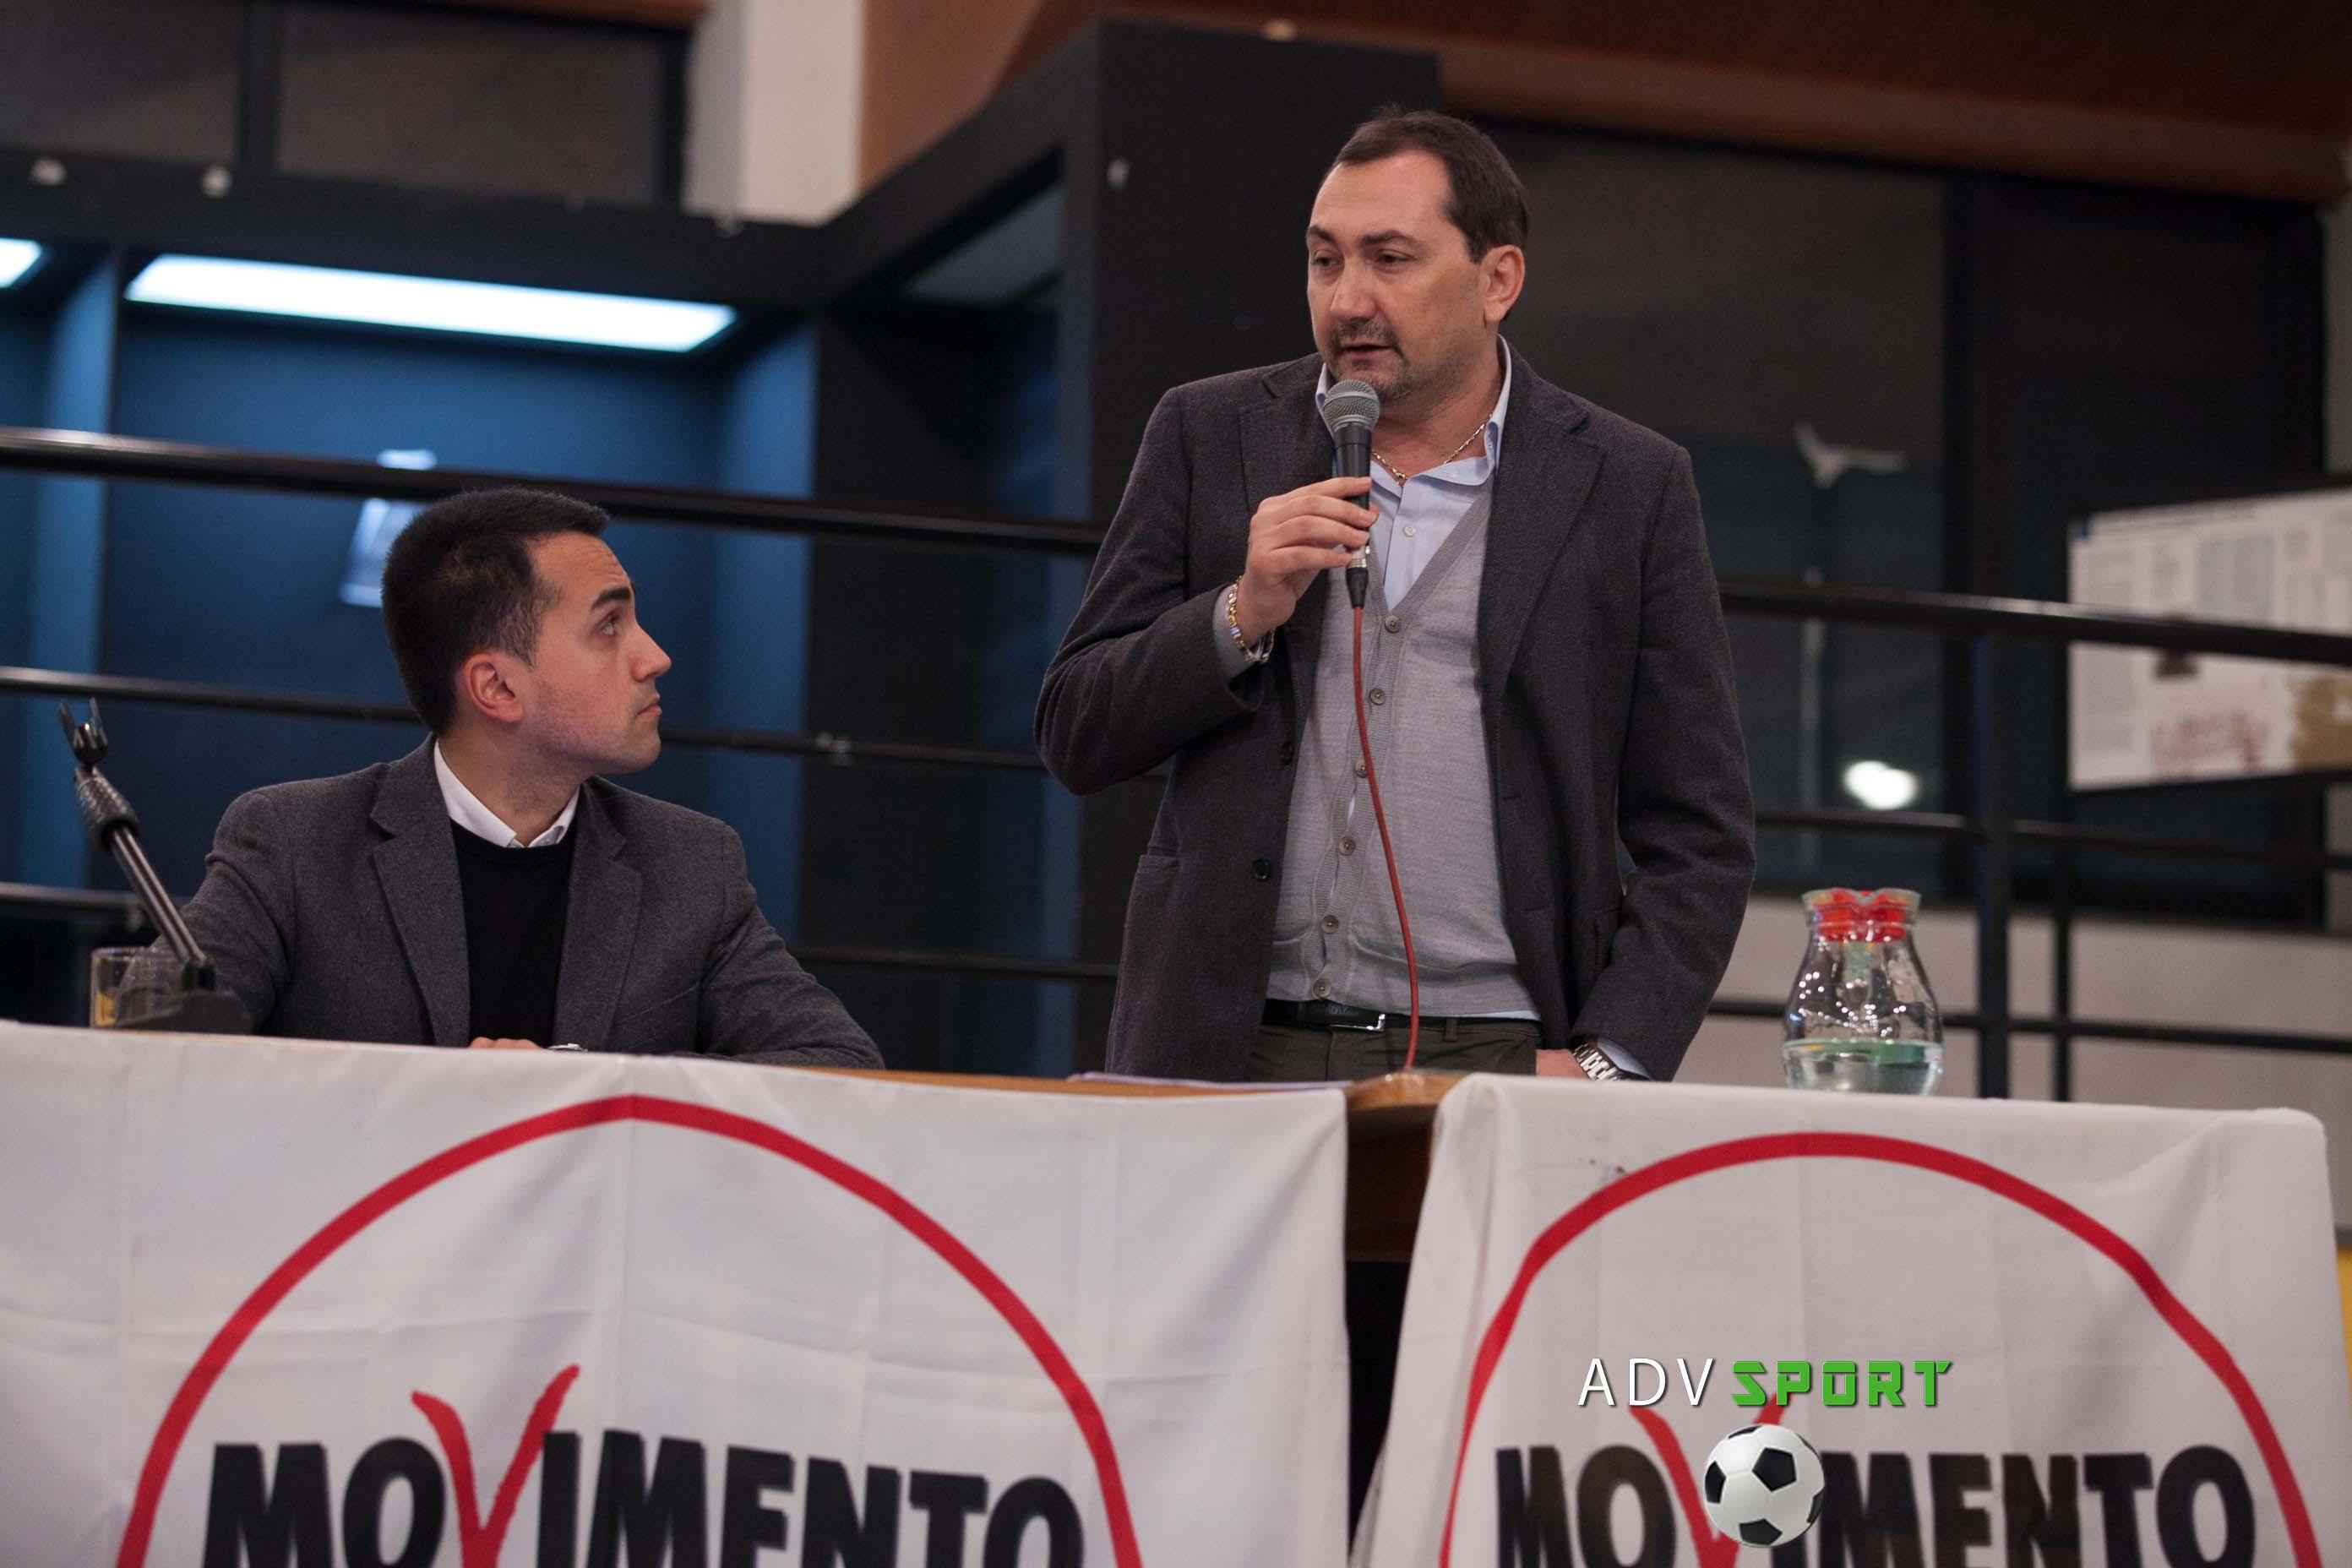 el abogado Alexandro Tirelli con el candidato al cargo de promer ministro de la Republica Italiana, Luigi Di Maio